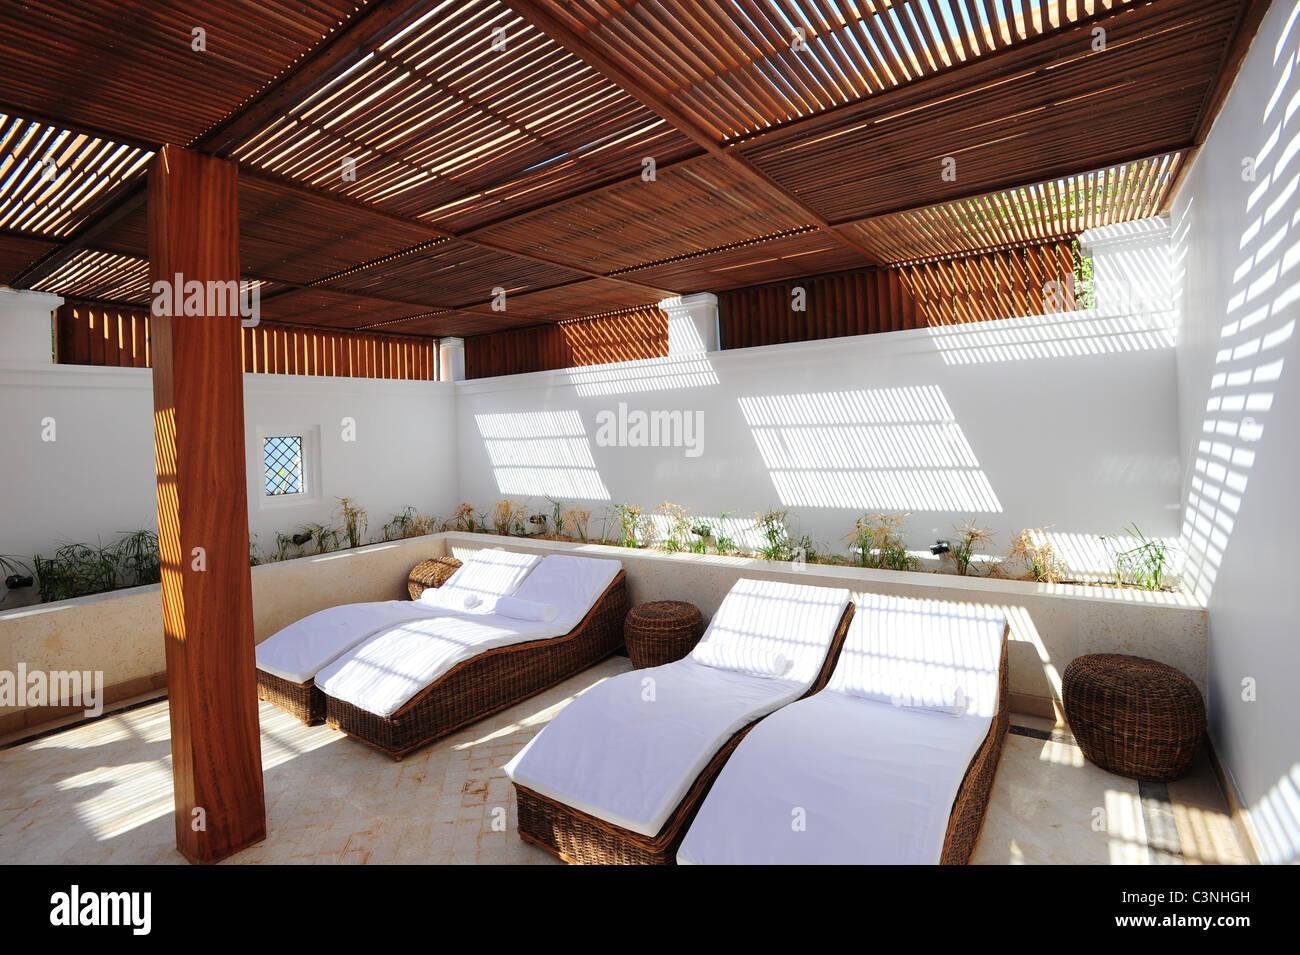 Africa Middle East Egypt Egyptian hotels luxury Luxor Hilton